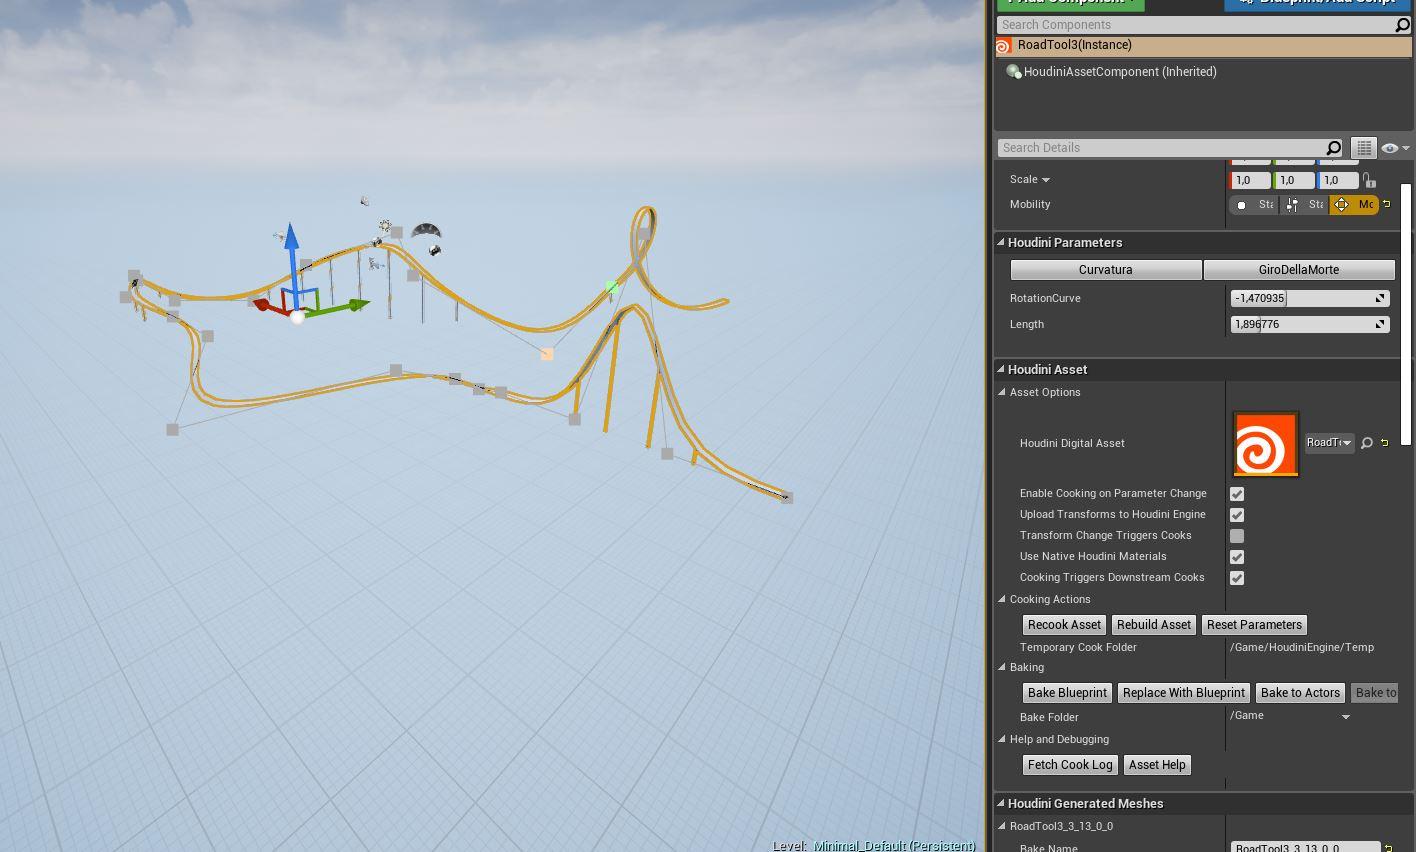 Procedural Spline generator from Houdini to Unreal - Games - od forum